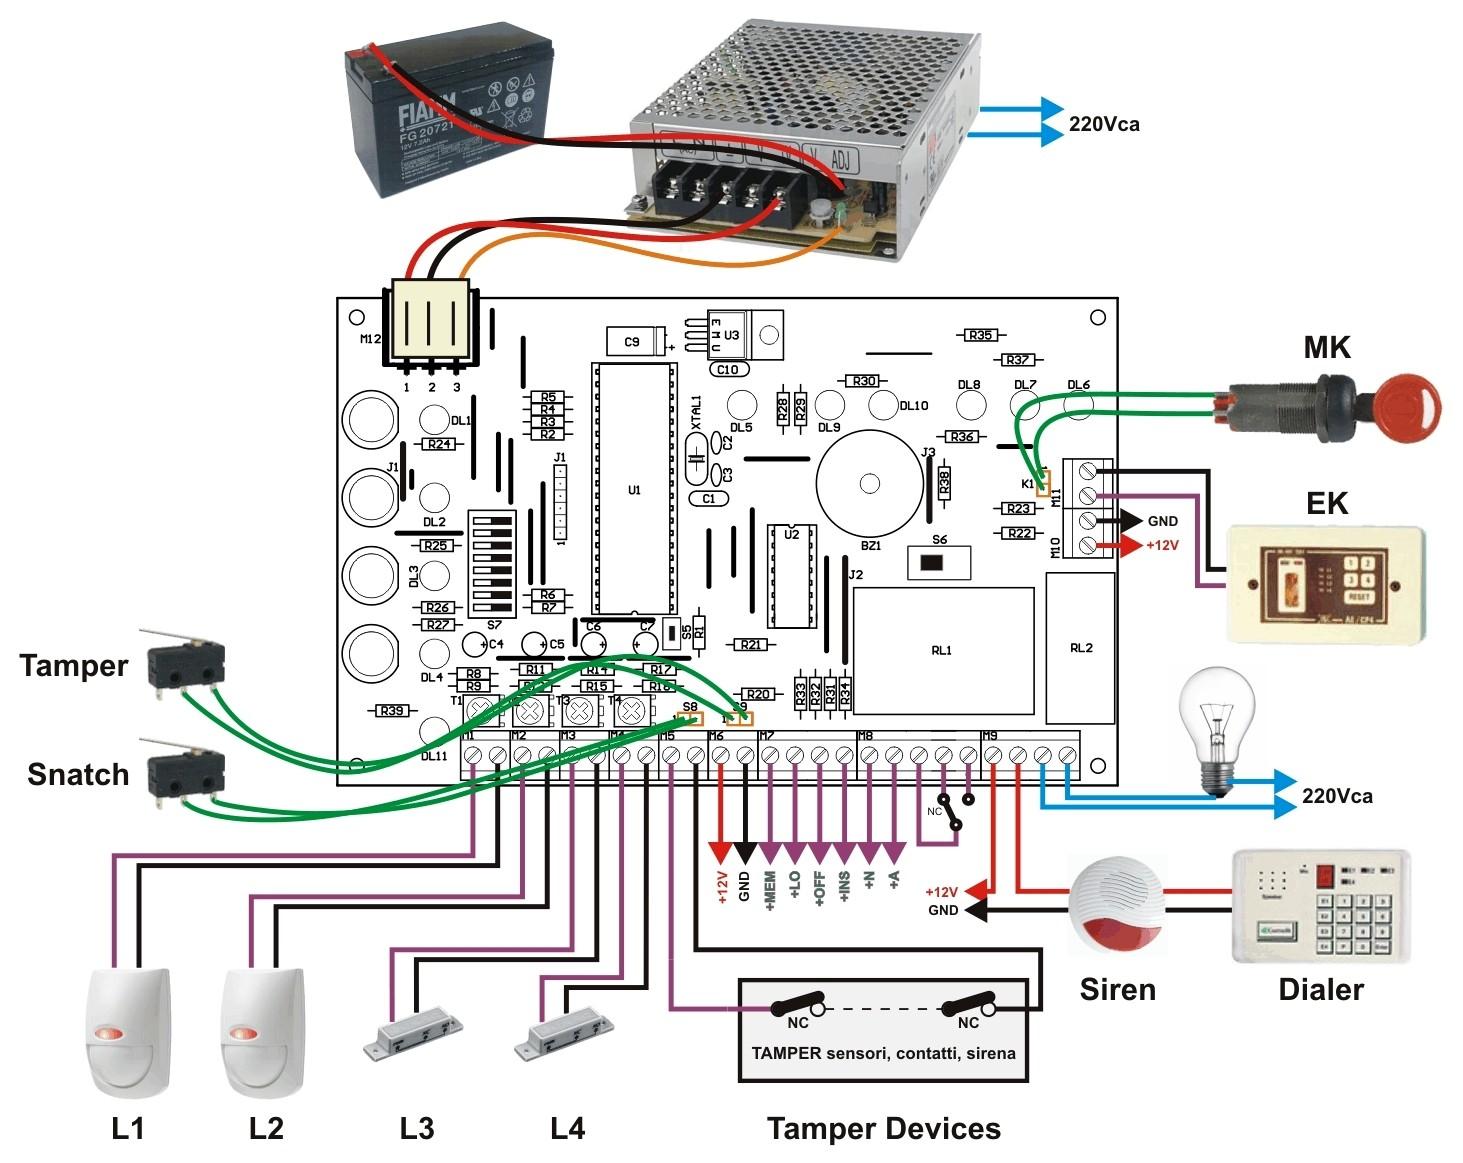 Schema Collegamento Antifurto Filare : Centrale antifurto zone burglar alarm control panel